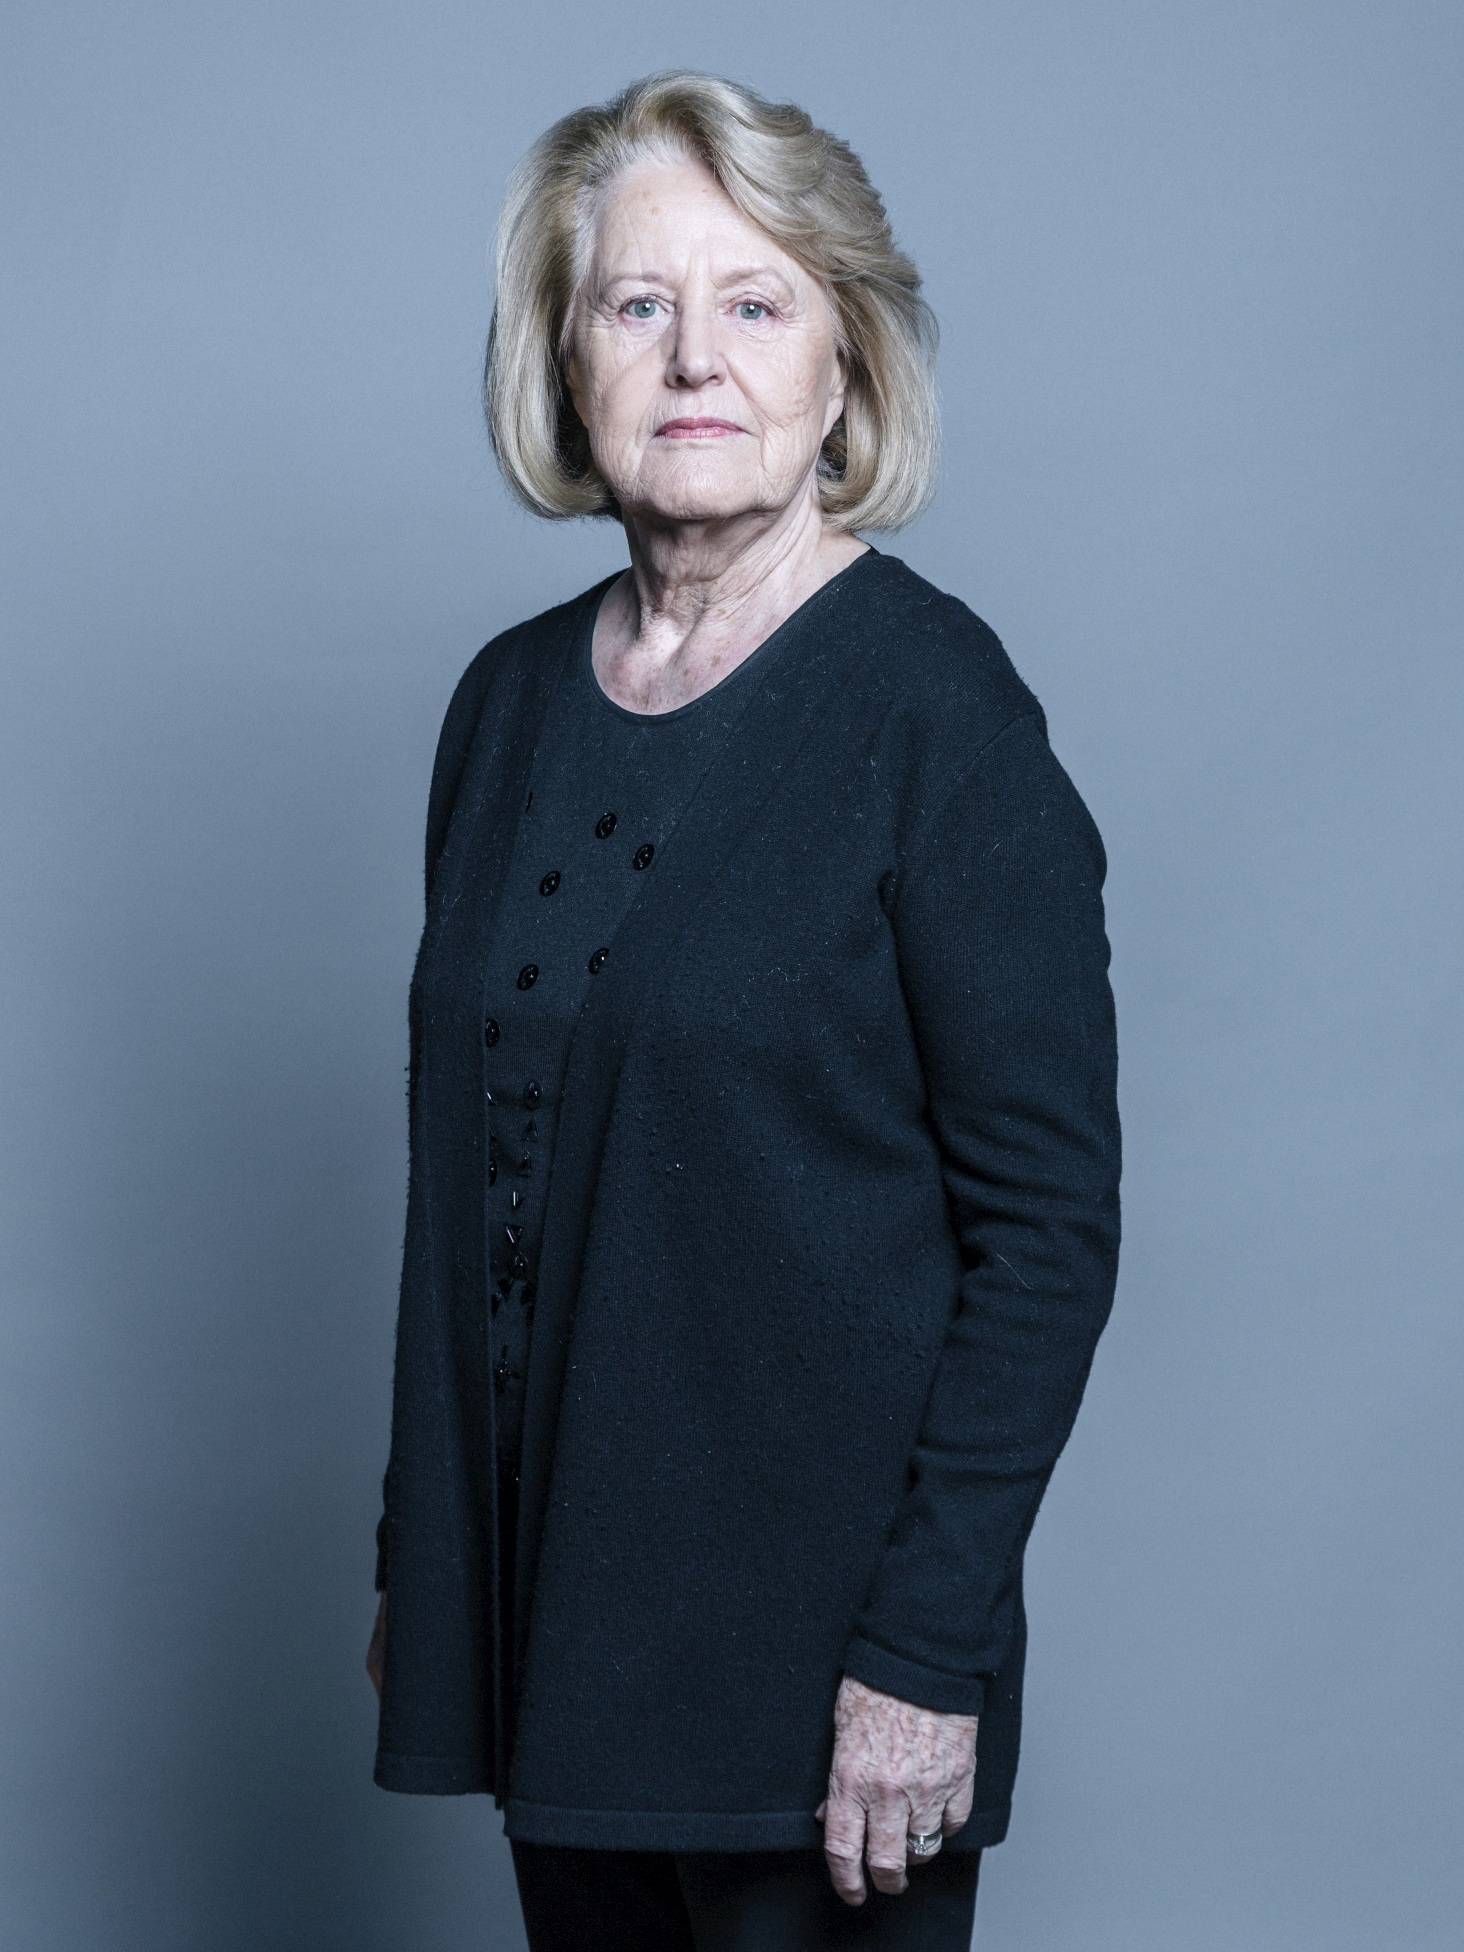 Baroness Smith of Gilmorehill